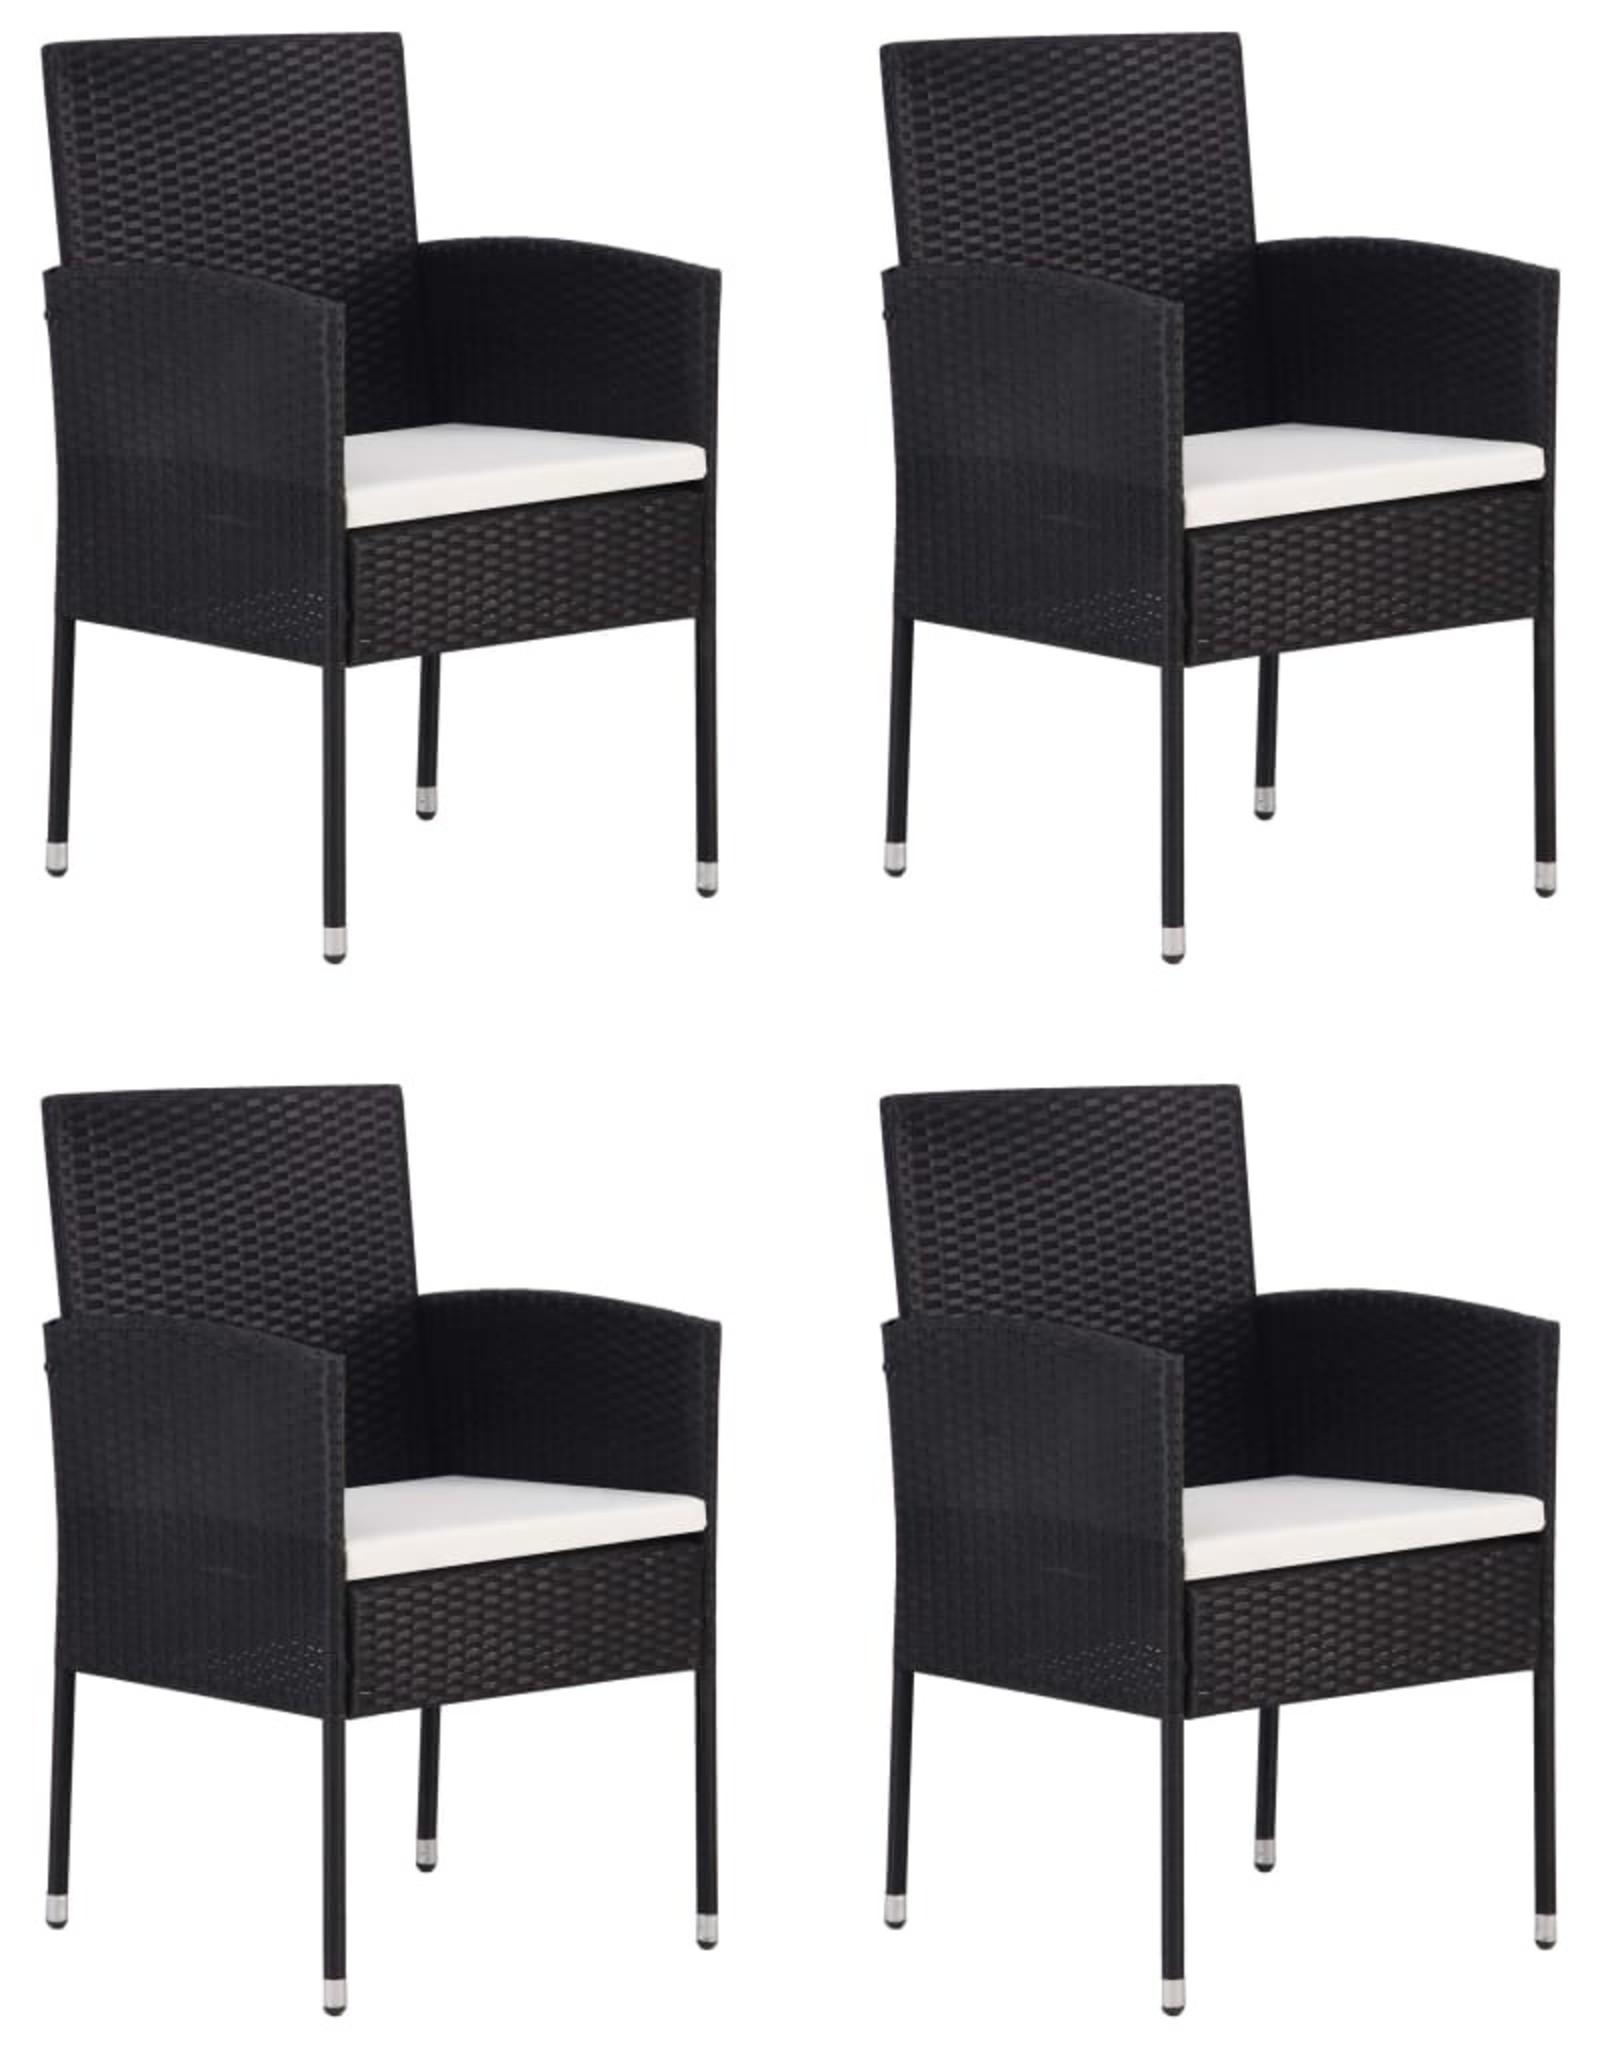 5-delige Tuinset zwart